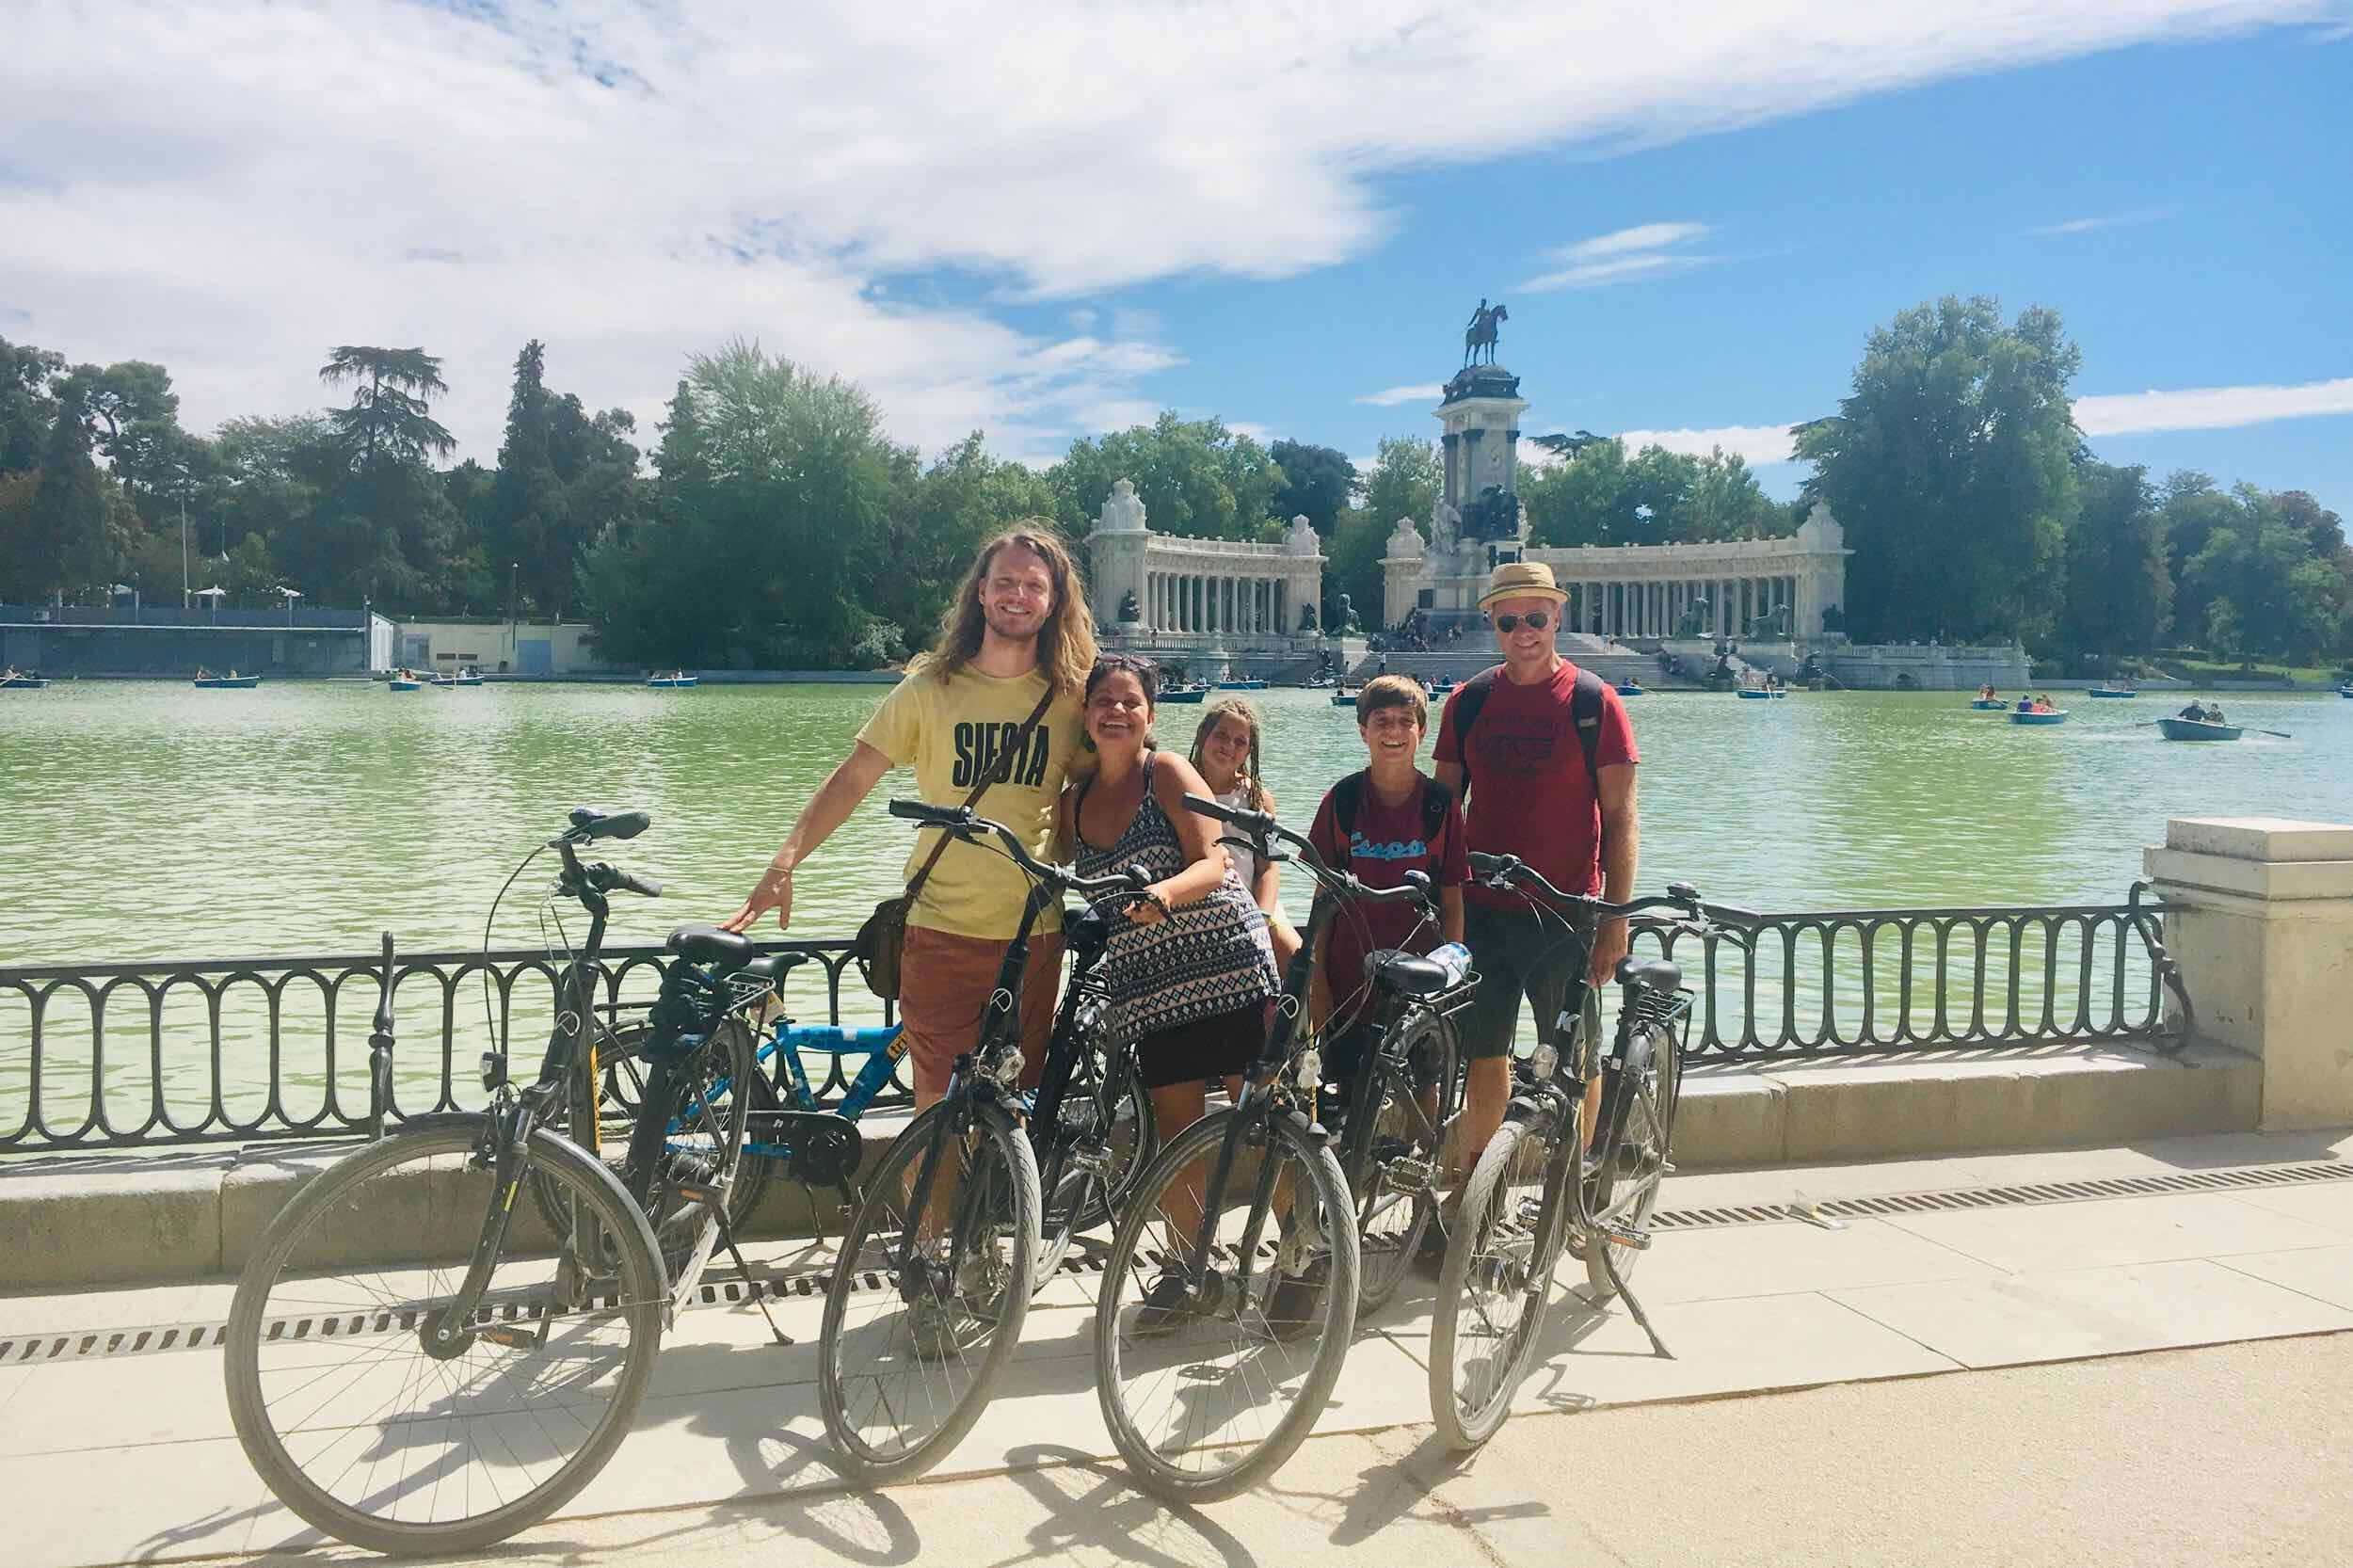 hemels-madrid-fietstour-guido.jpg